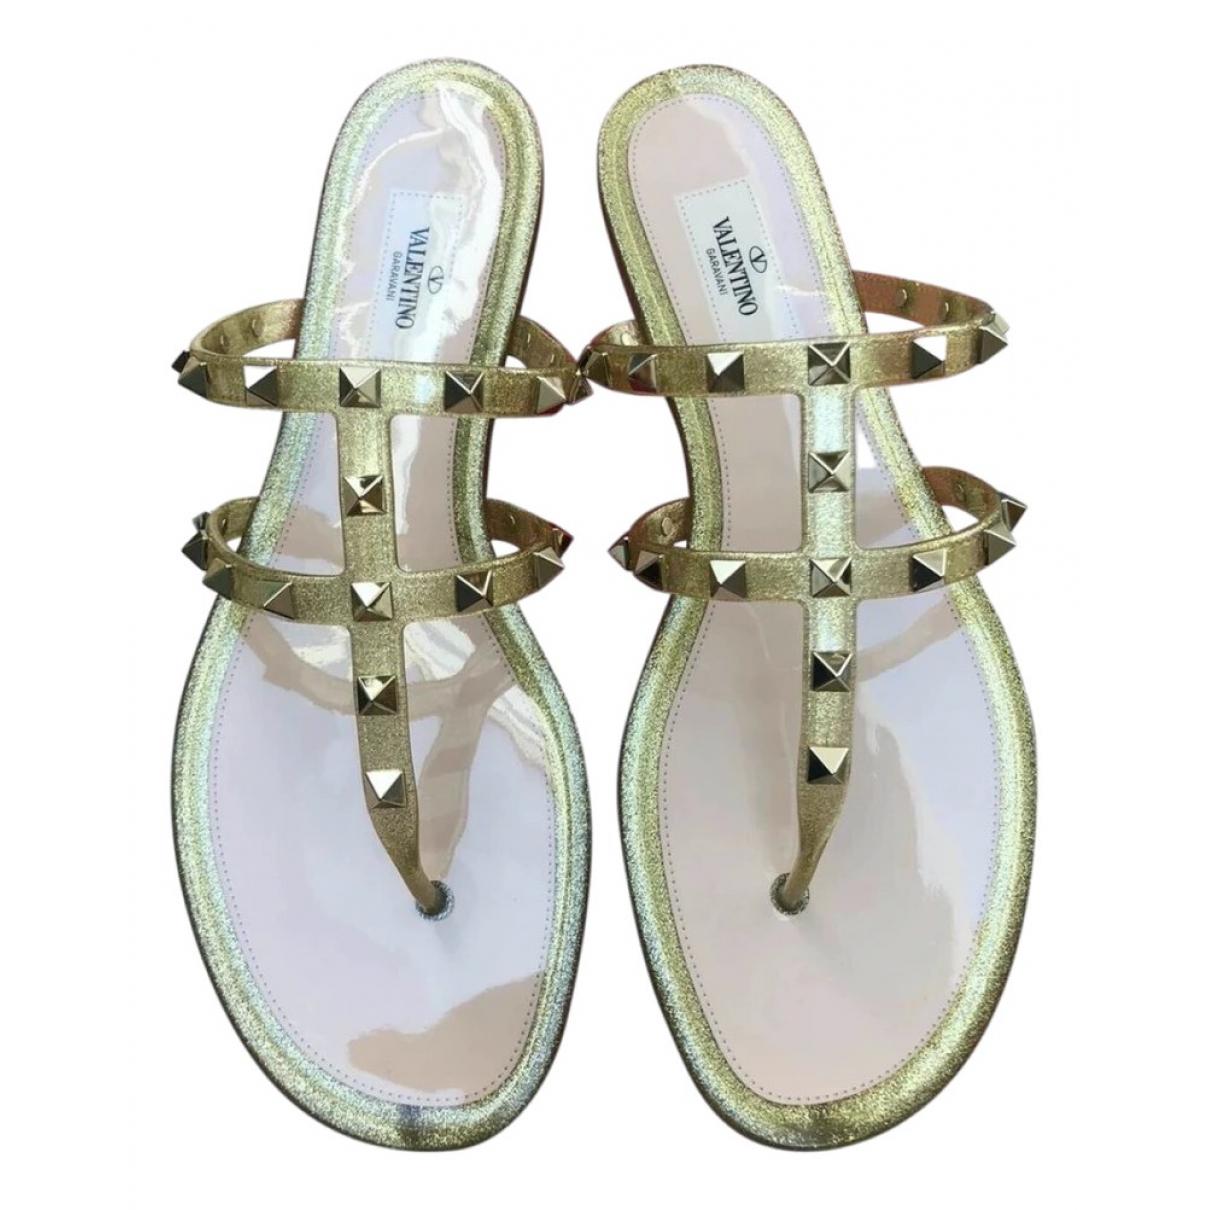 Valentino Garavani Rockstud Gold Sandals for Women 38 EU